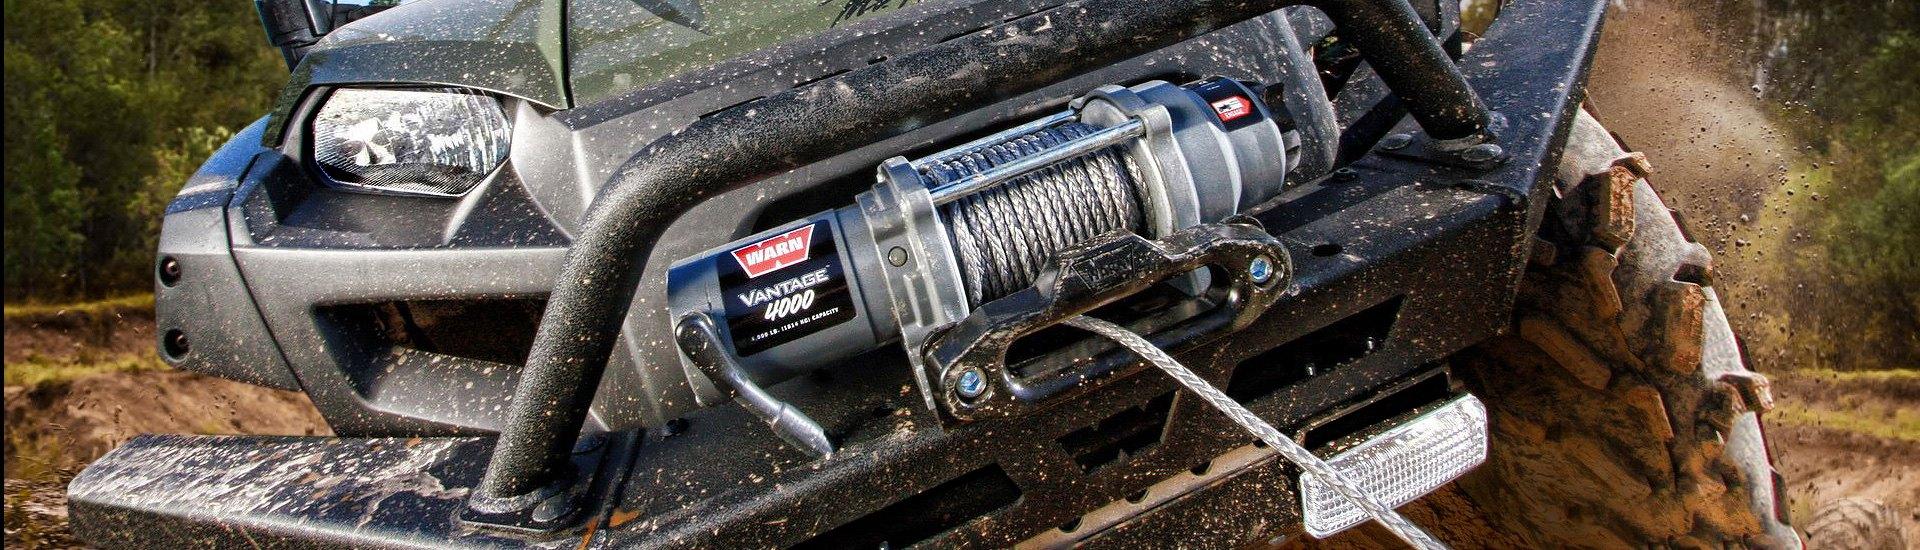 ATV//UTV Winch Kit Control Mounting Cable Magnet New Champion 100127 2200-lb